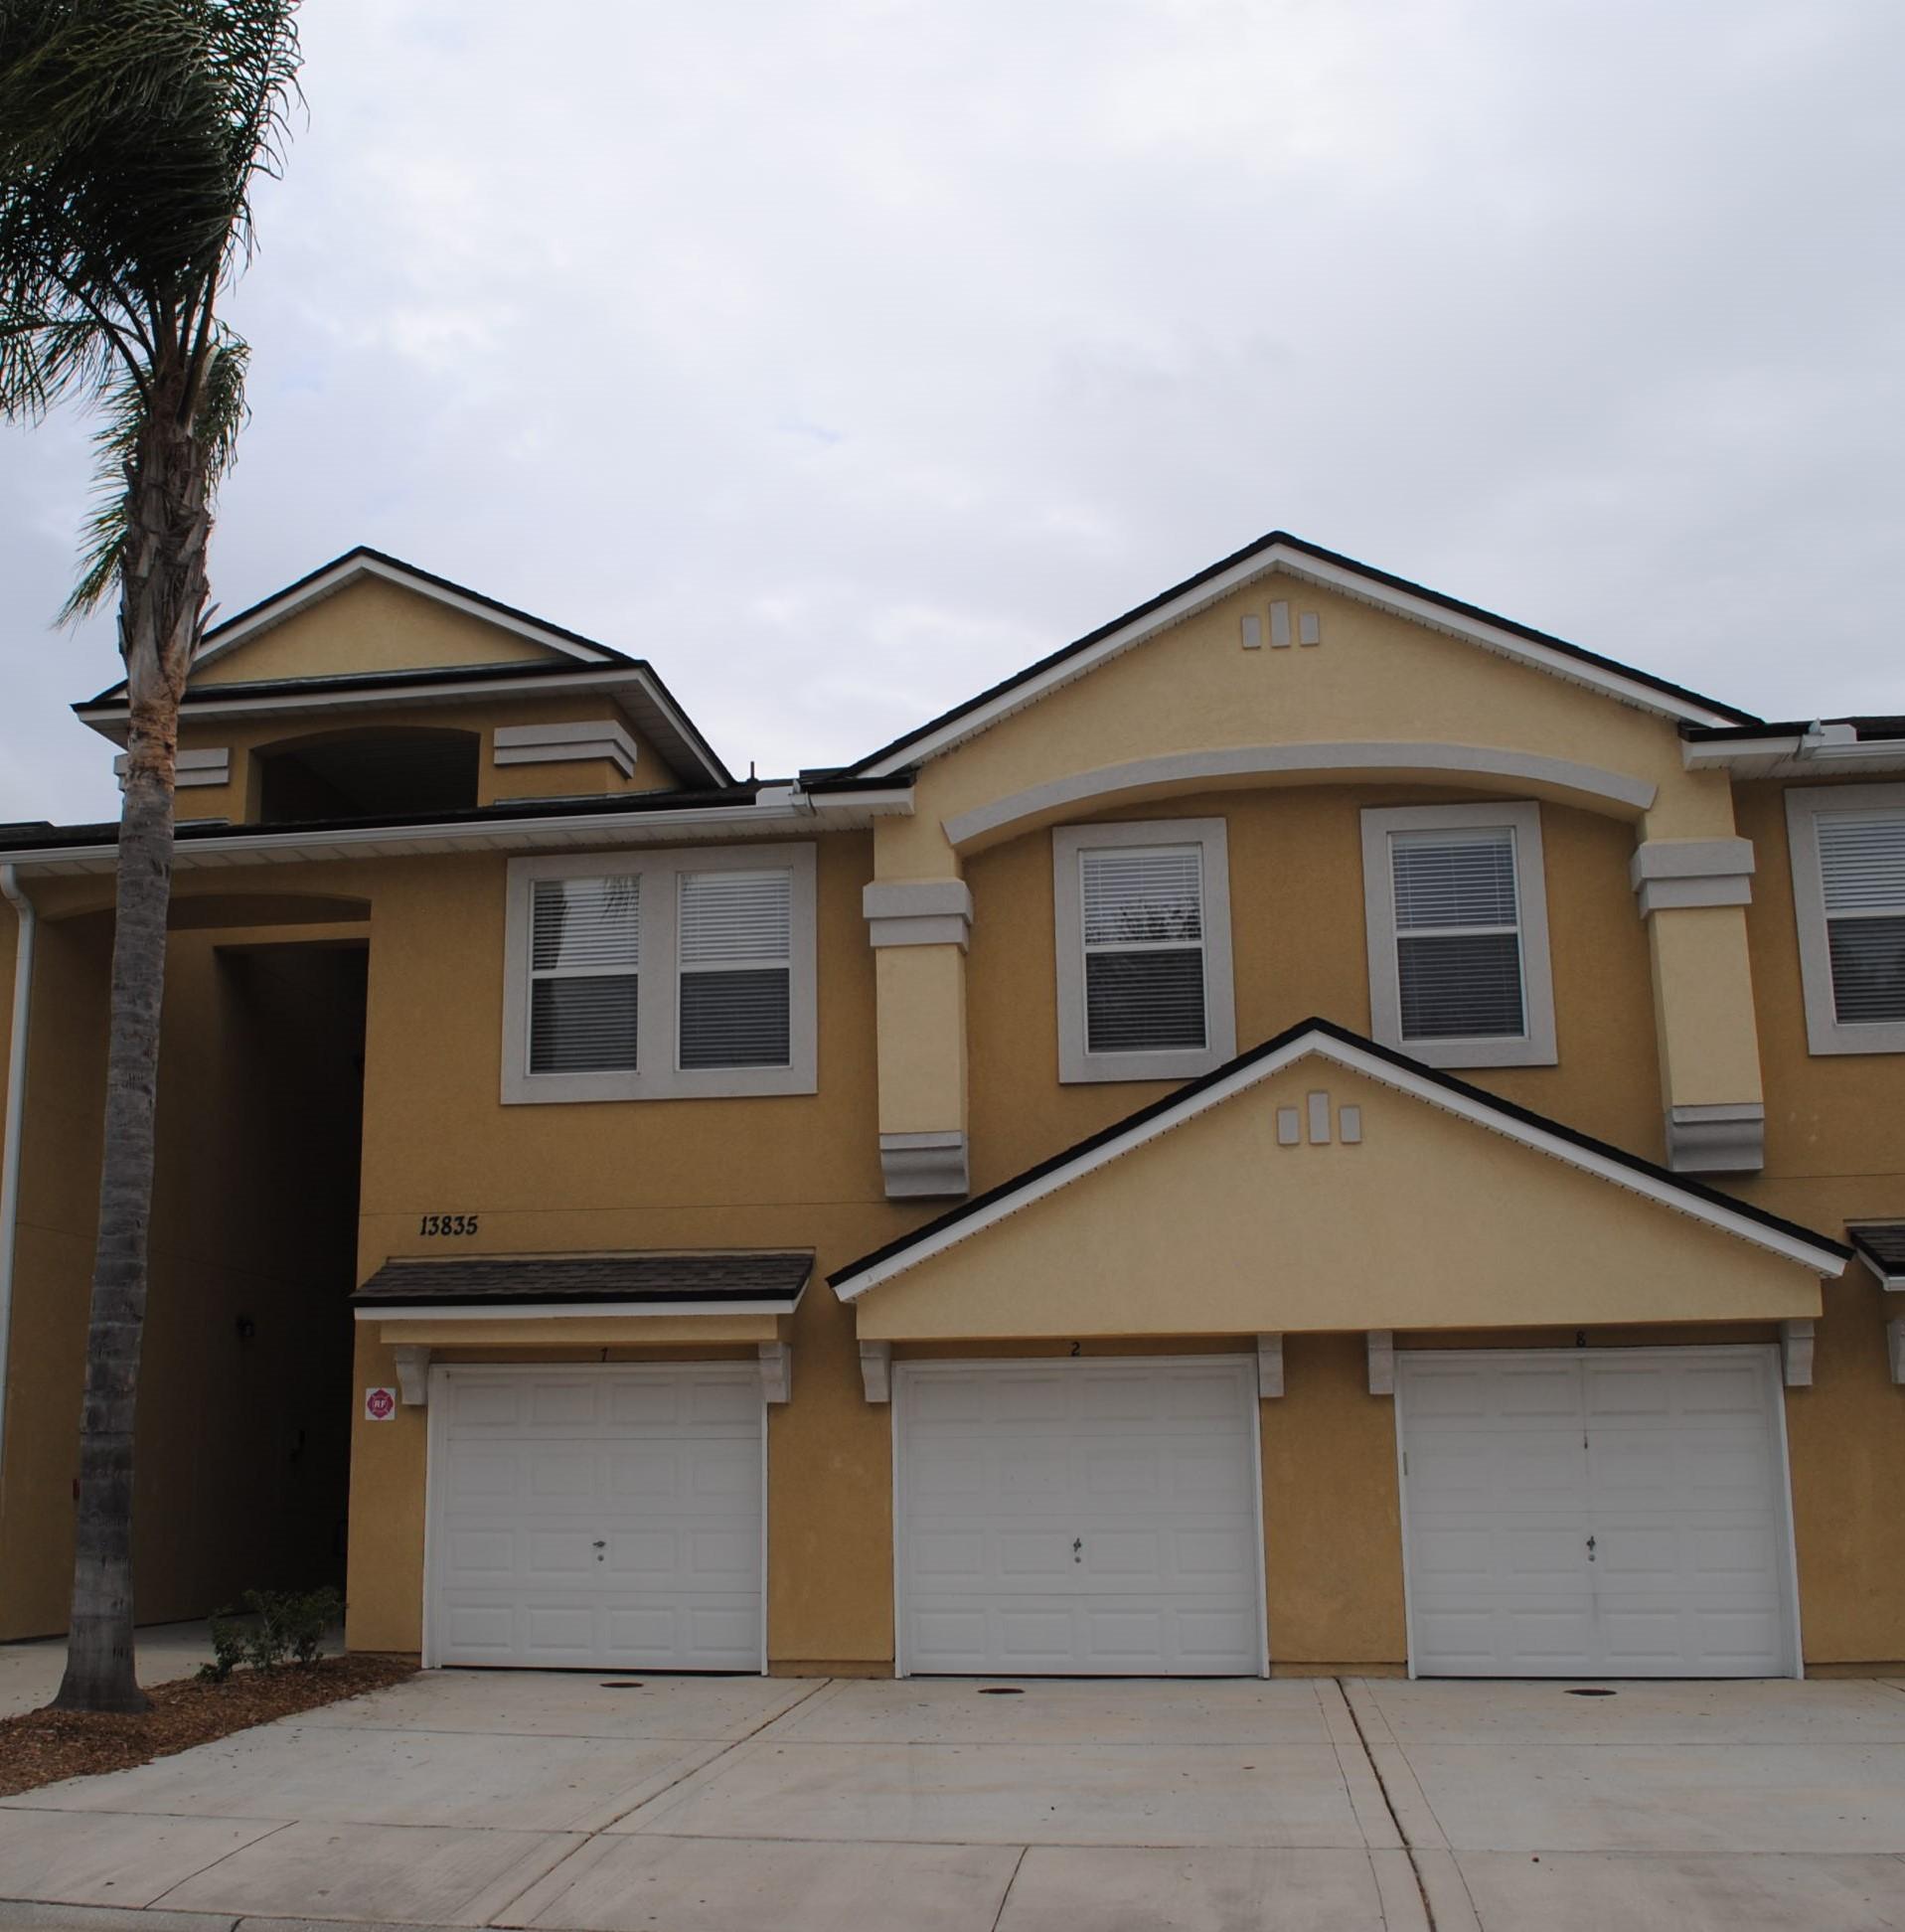 13835 Herons Landing Way Jacksonville Fl 32224 2 Bedroom Apartment For Rent For 1 150 Month